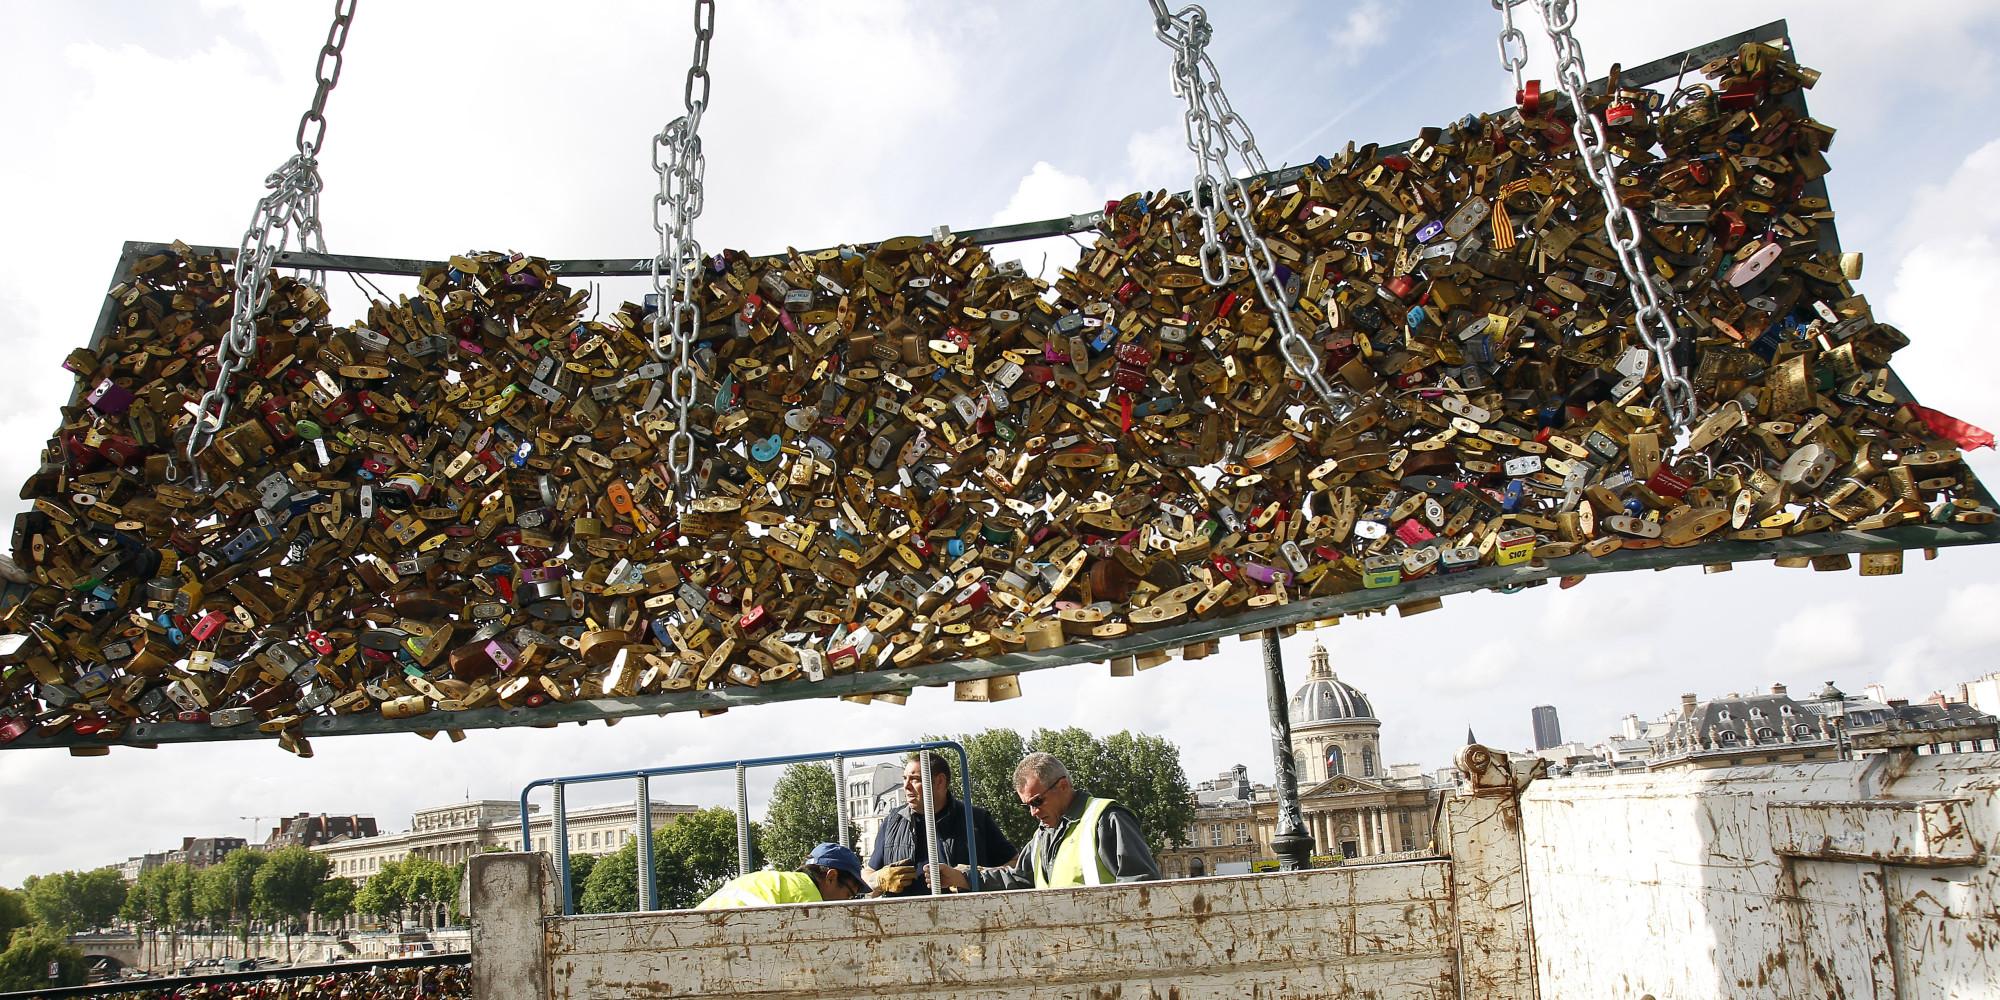 Paris 39 love locks 39 removed from famous bridge as city for The lock bridge in paris